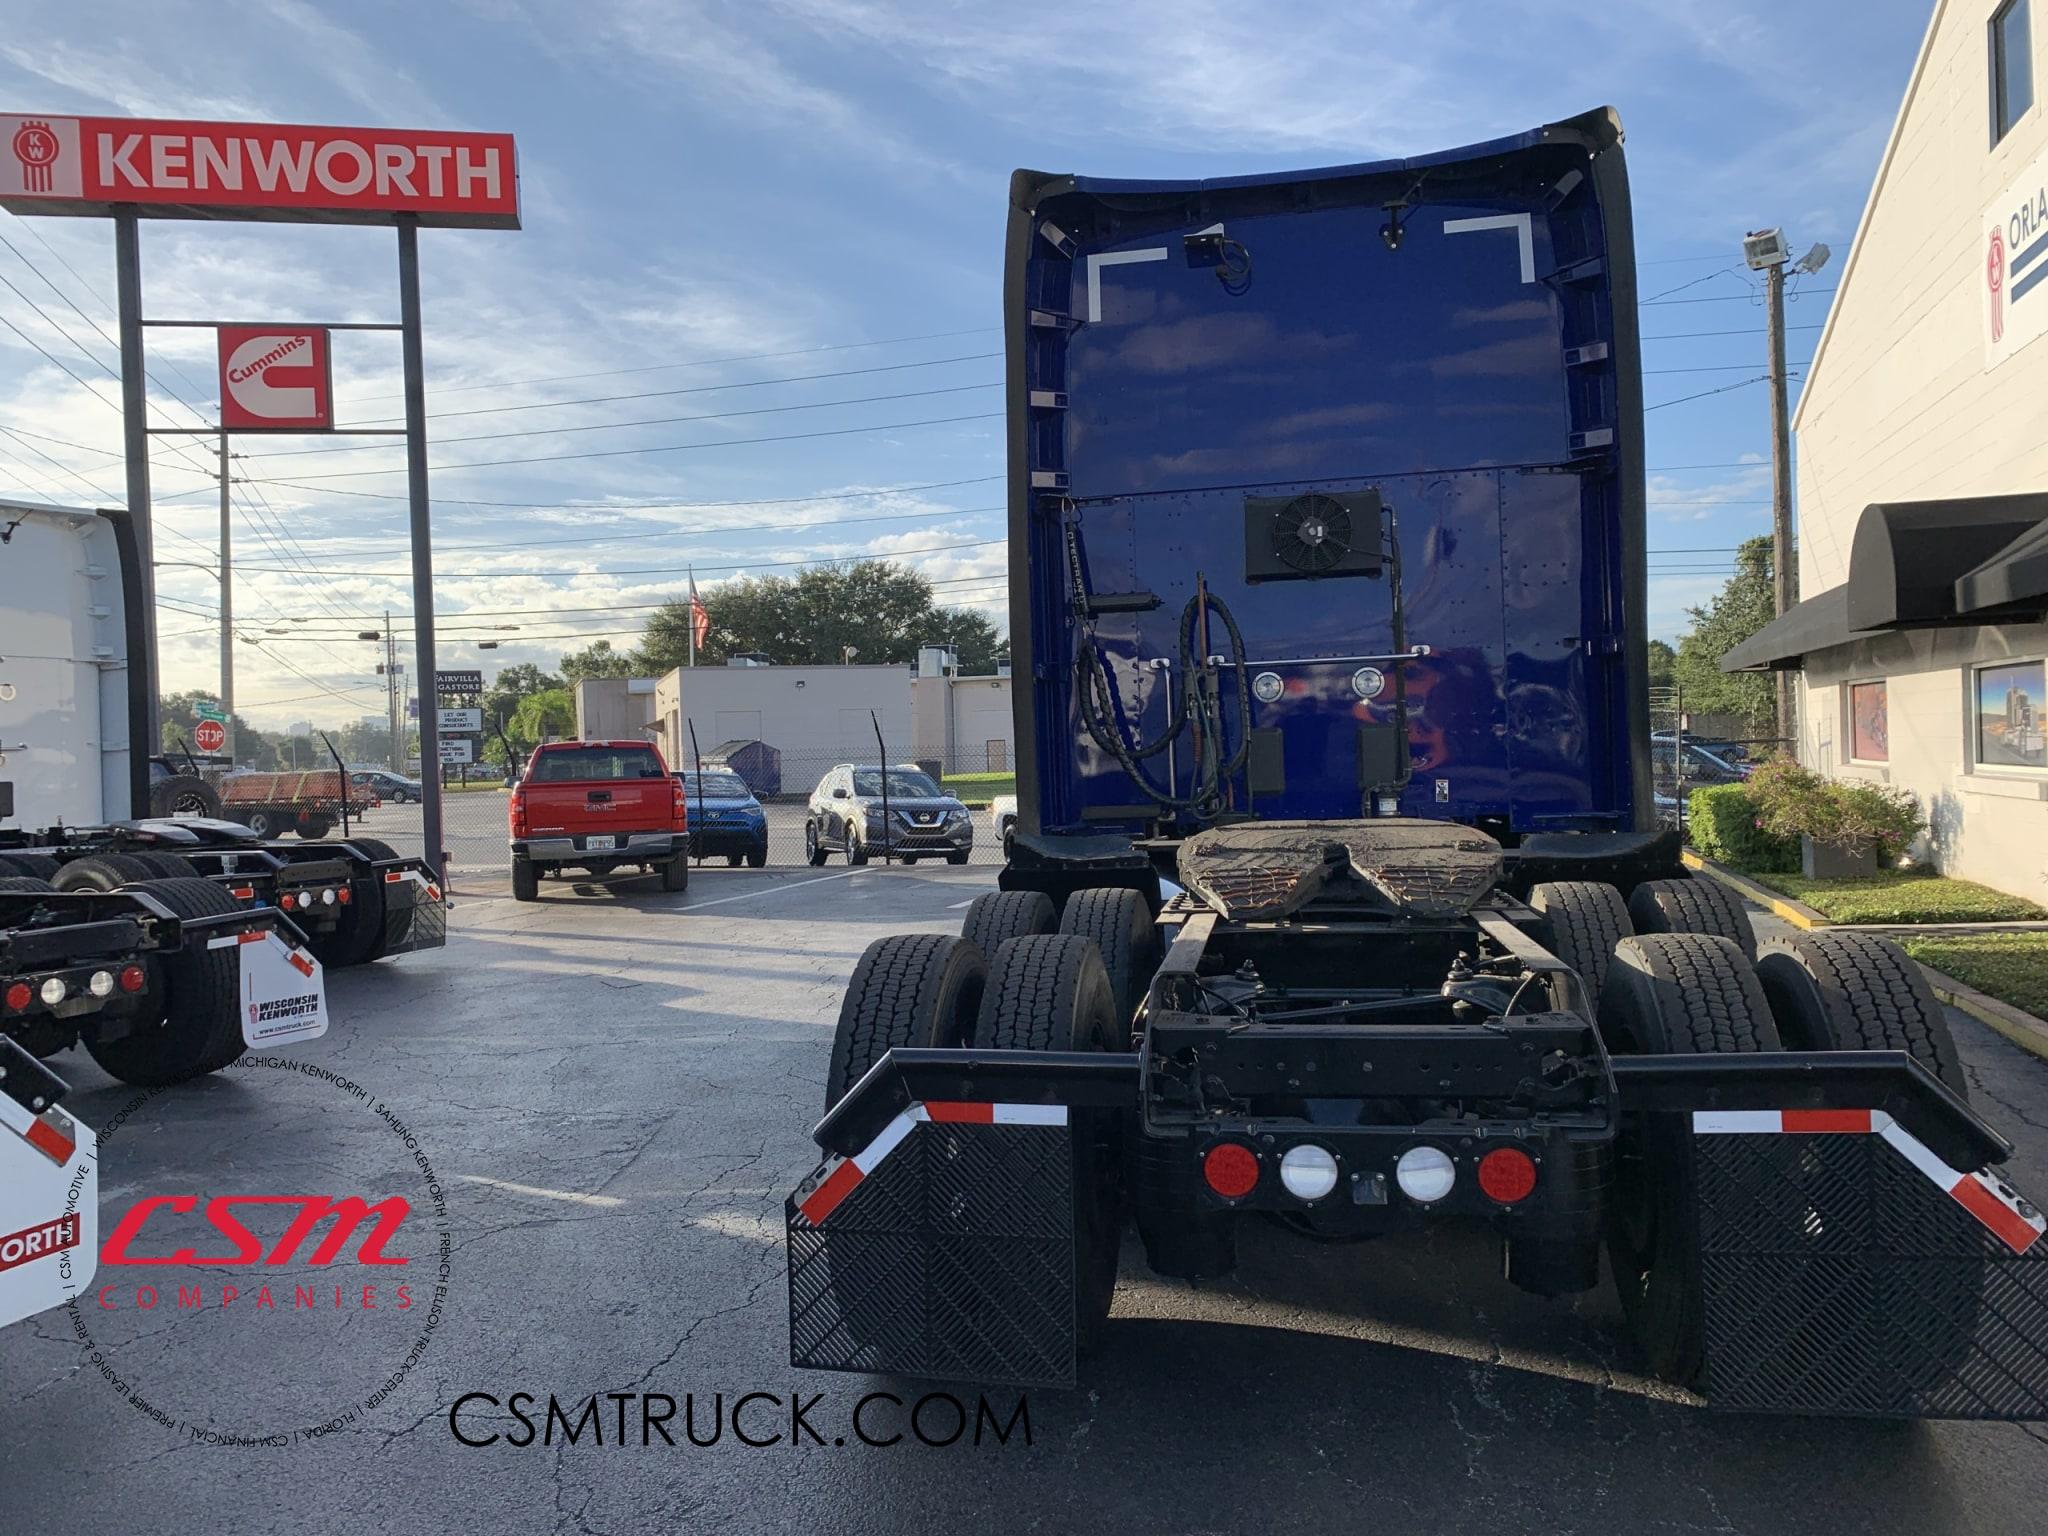 2018 Kenworth T680 UJJ175351 full